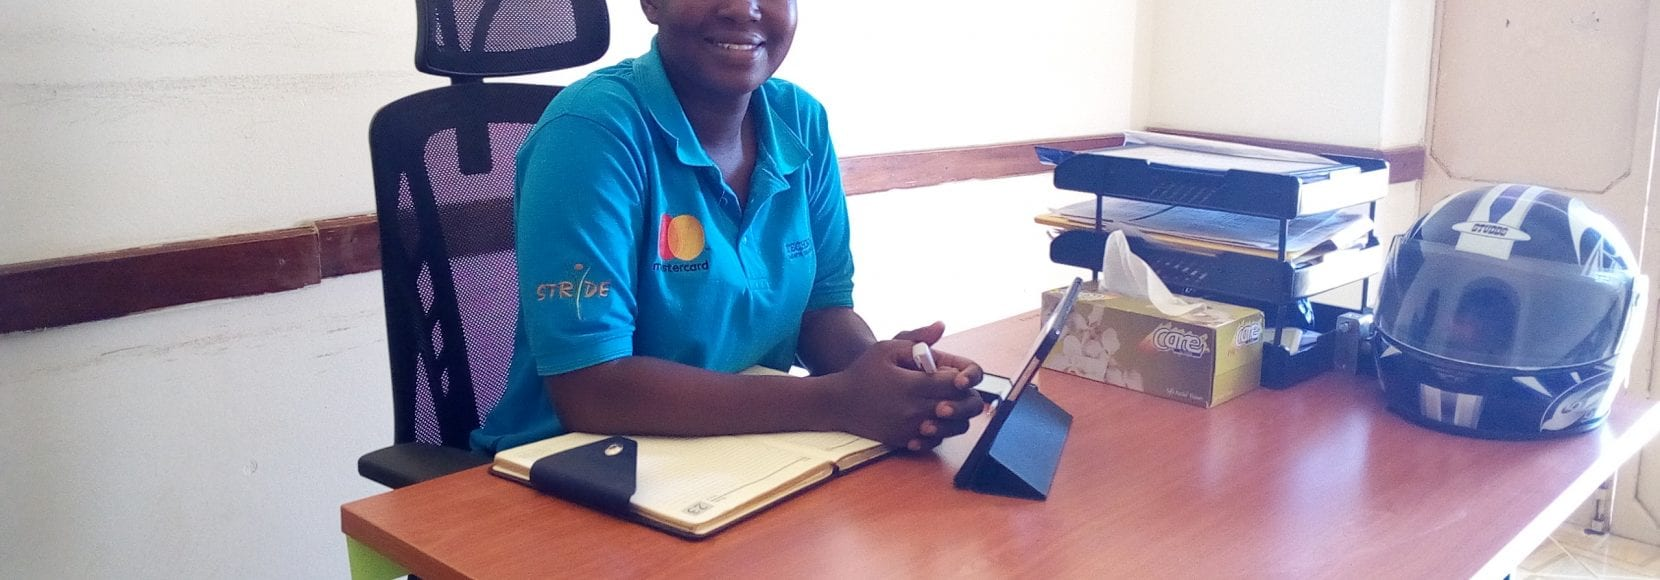 Smiling business woman in Uganda